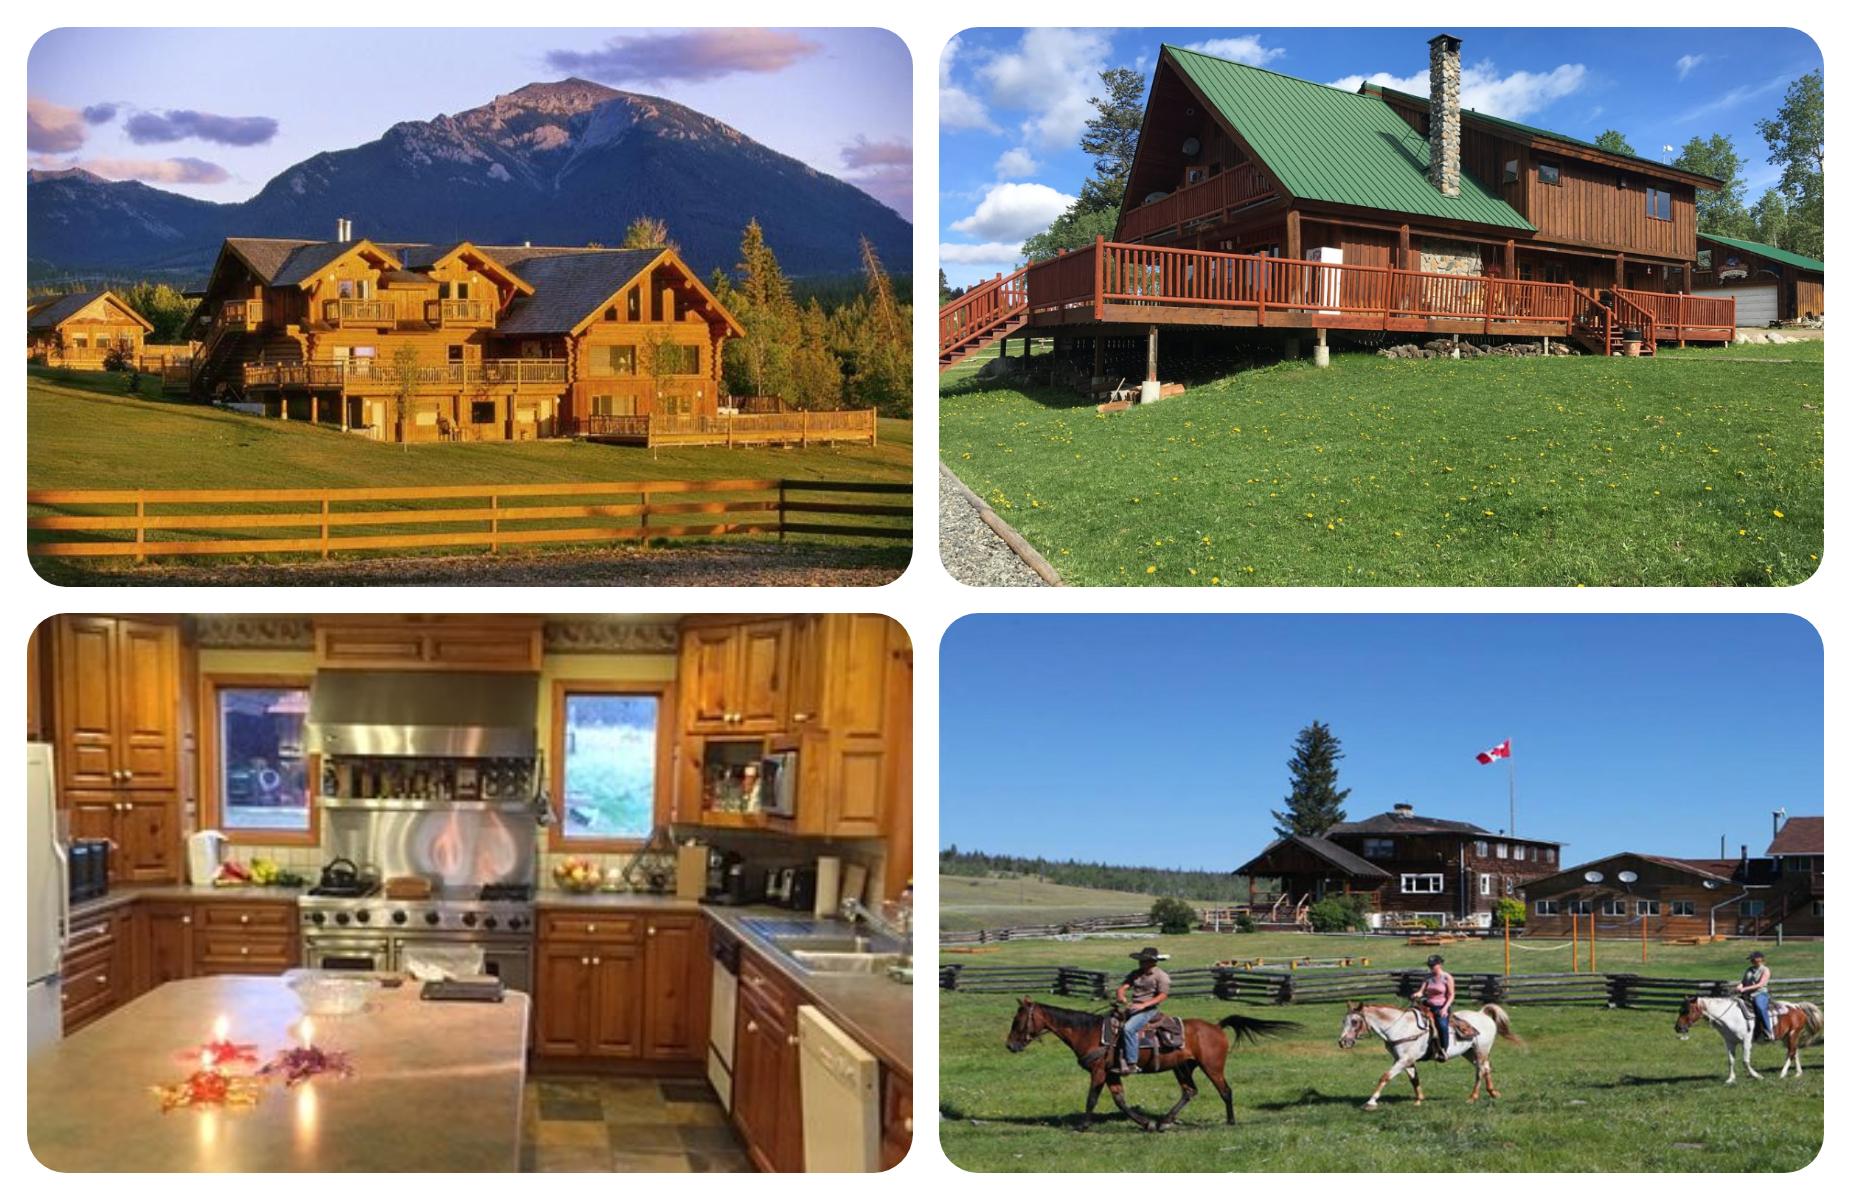 Montana hill